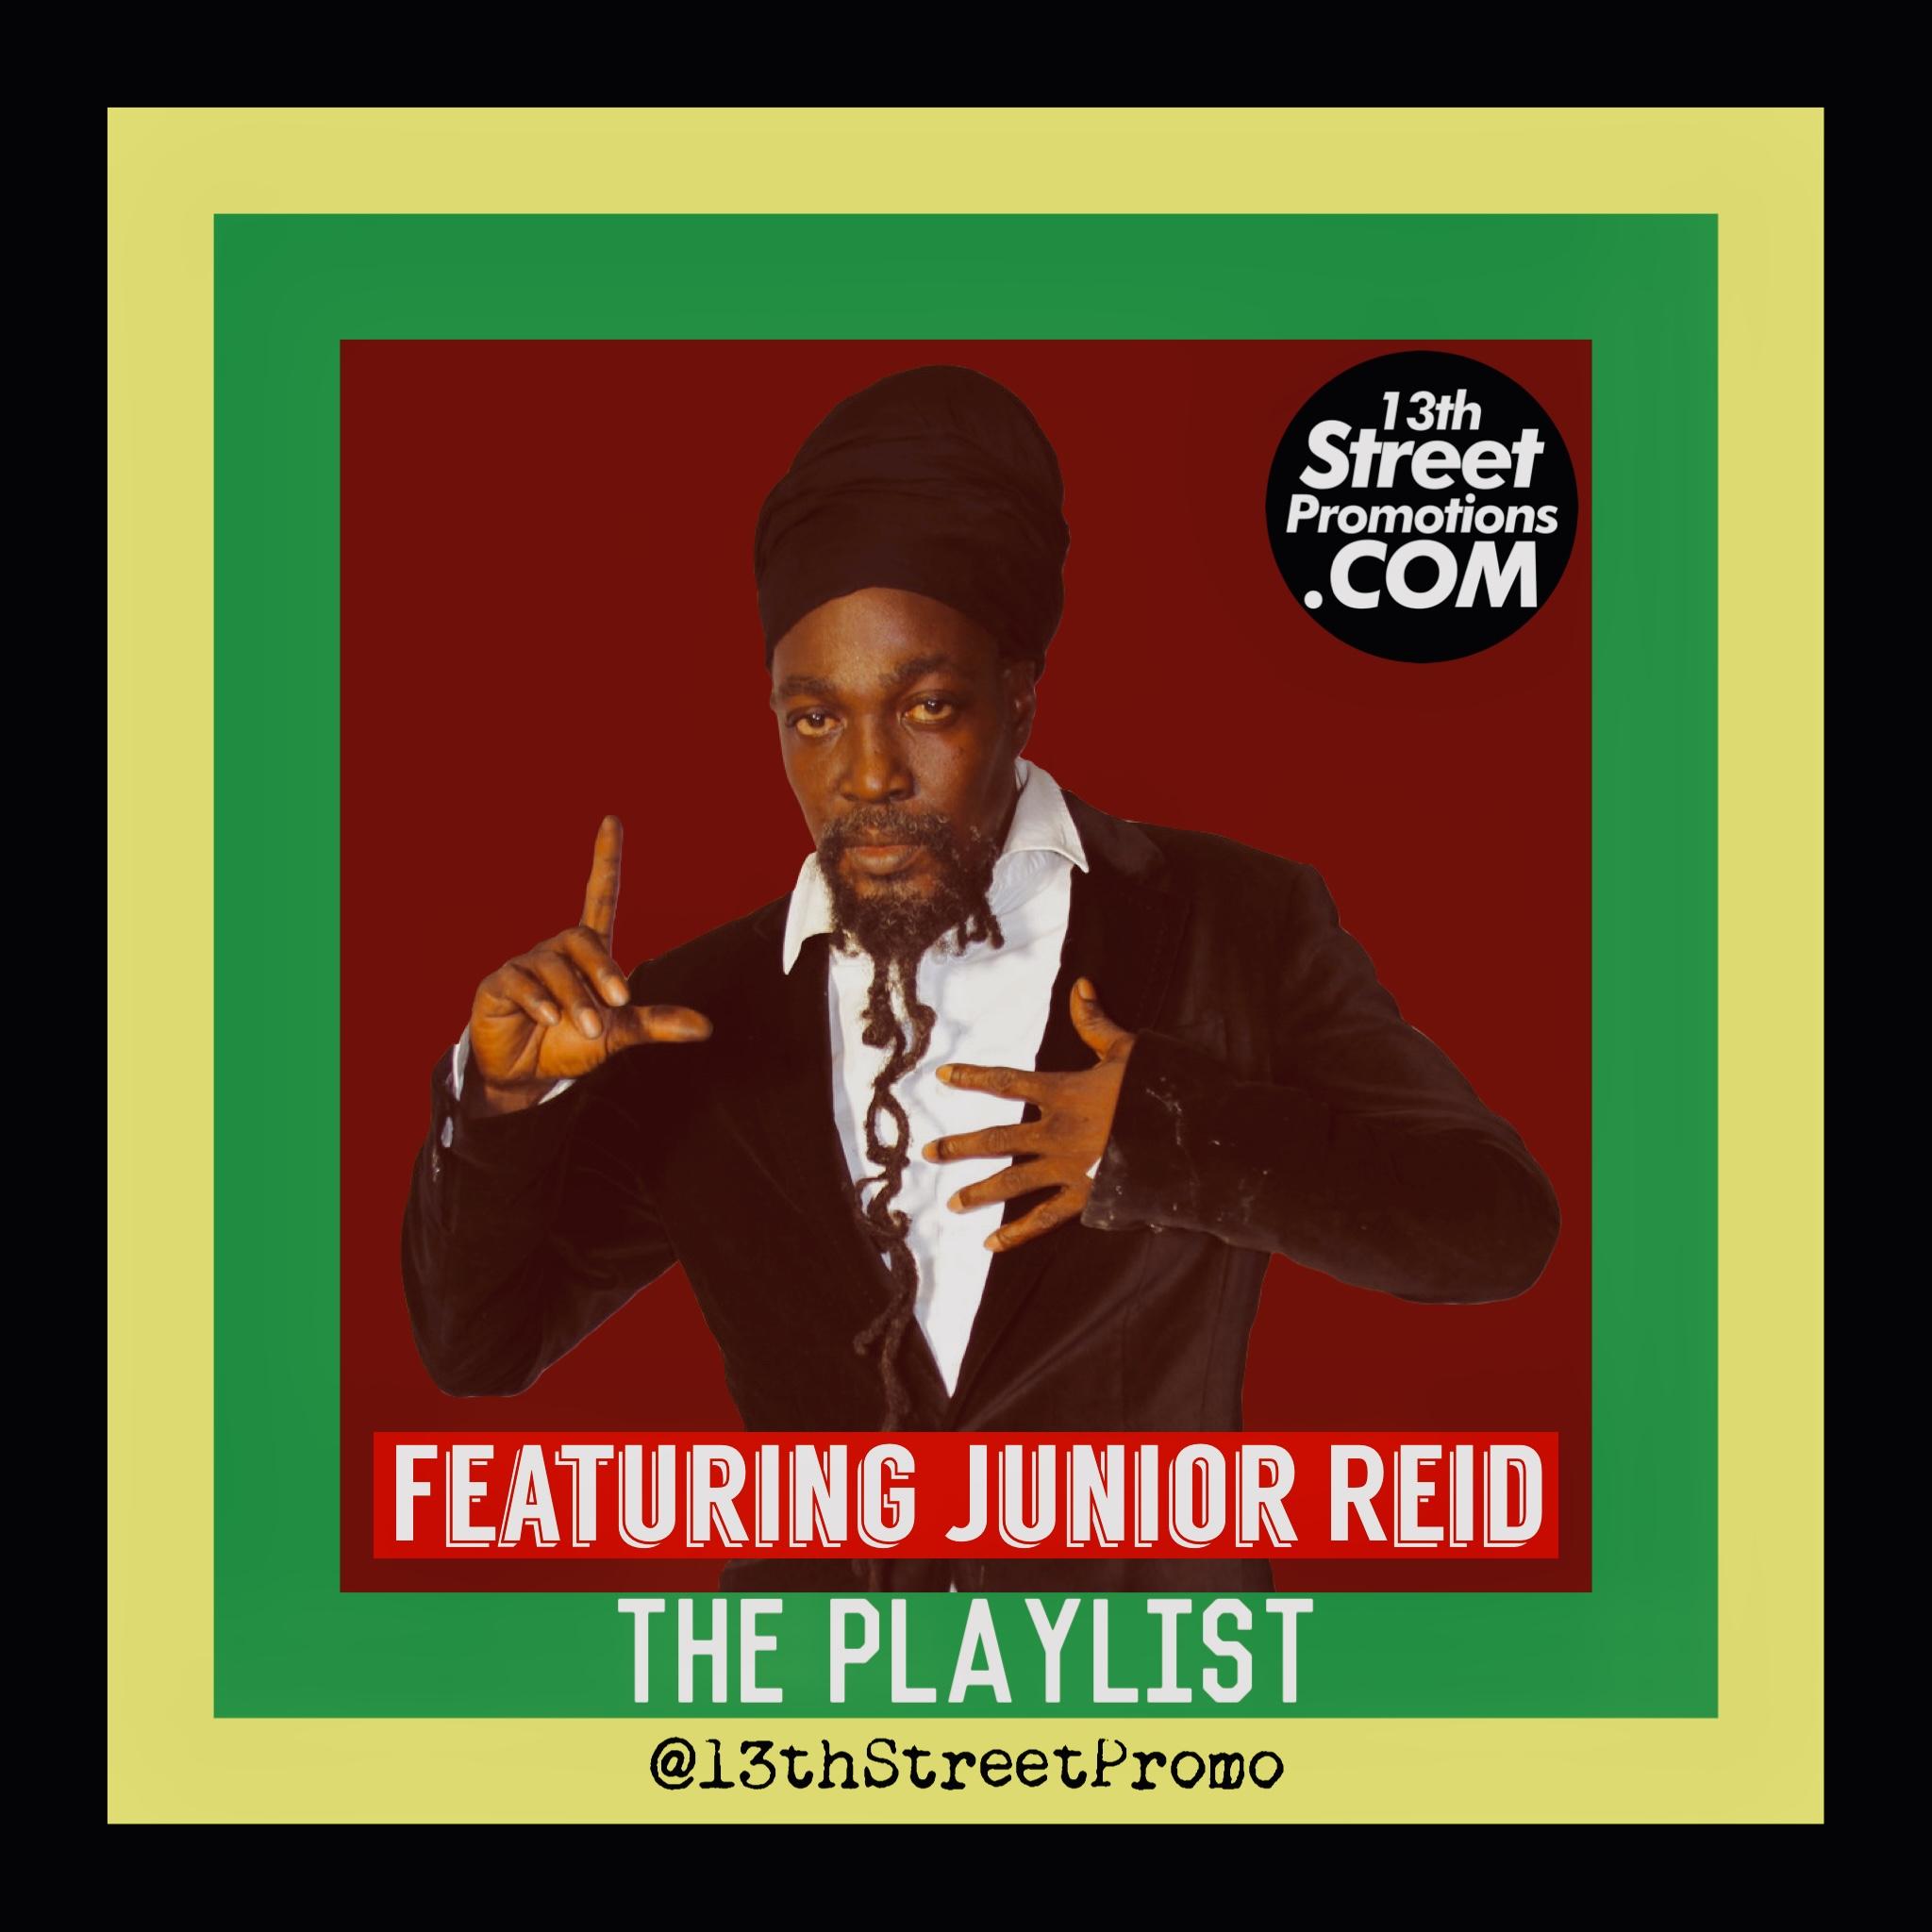 Featuring-Junior-Reid-The-Playlist Jamaica Dancehall Reggae Hip Hop Pop Music Blog 13thStreetPromotions 13thStreetPromo Junior Reid Caribbean Playlist Spotify Tidal